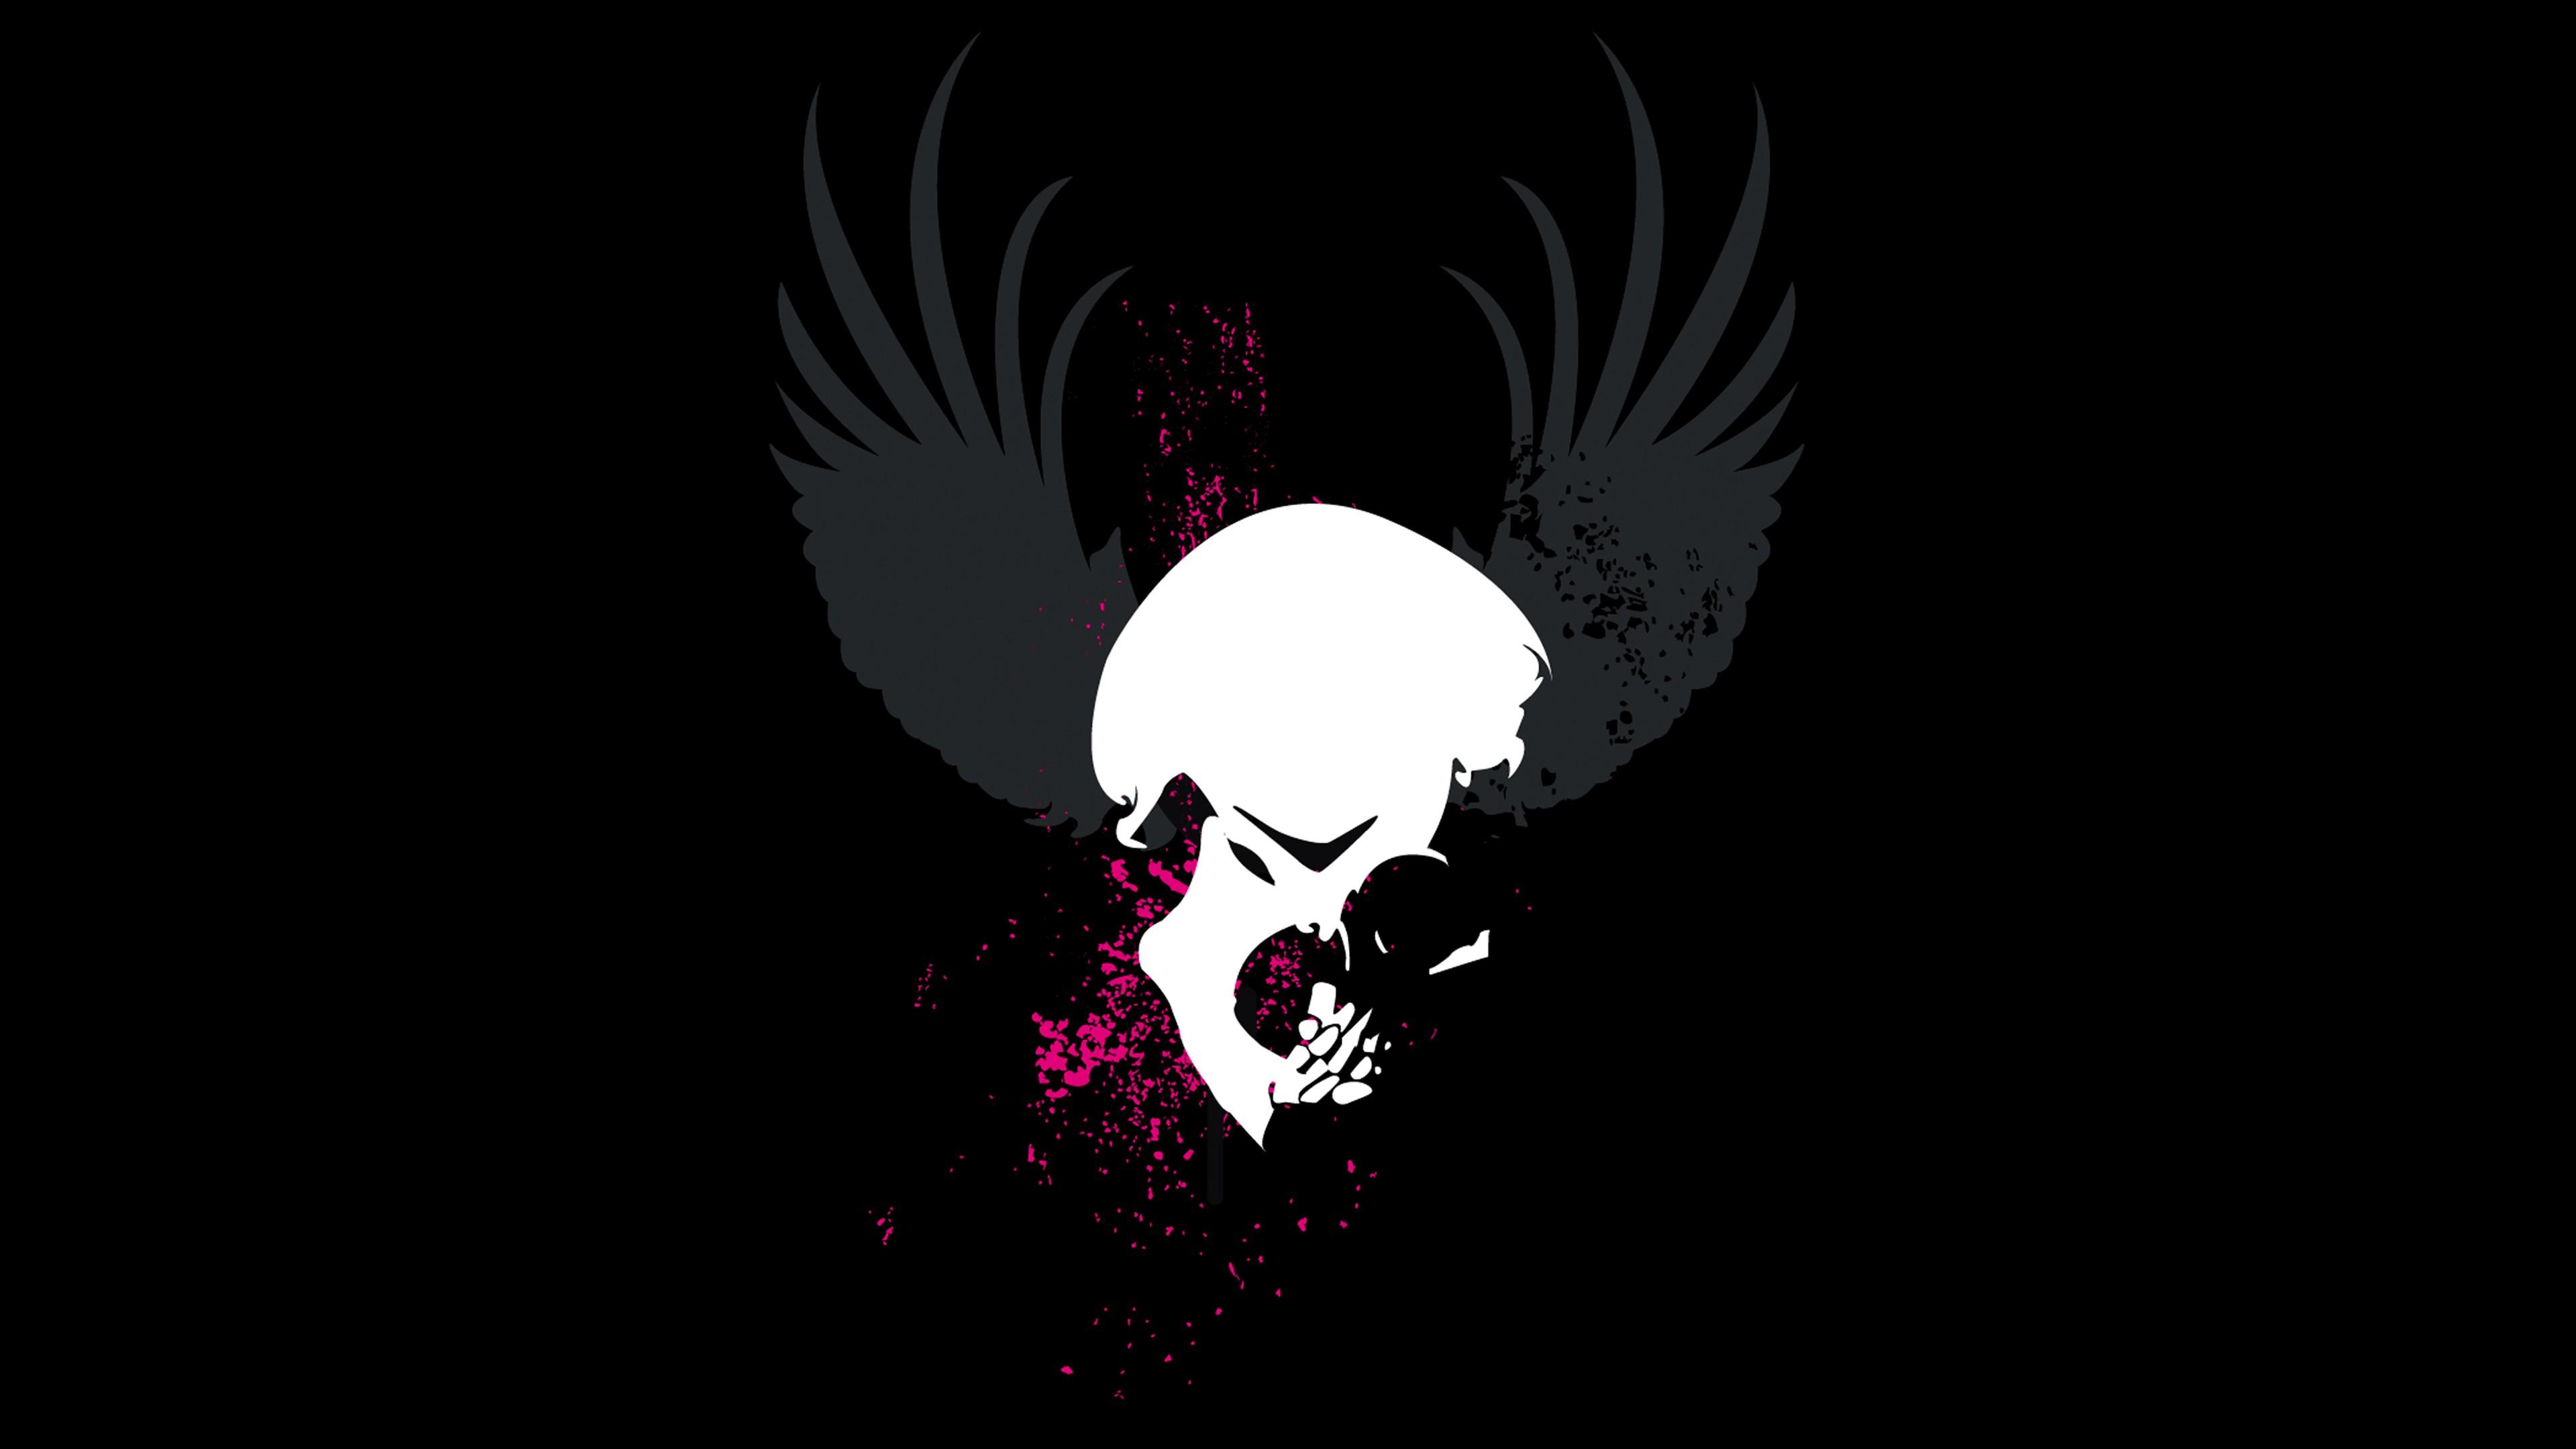 skull grunge wings dark 4k 1540754526 - Skull Grunge Wings Dark 4k - wings wallpapers, skull wallpapers, hd-wallpapers, dark wallpapers, 4k-wallpapers